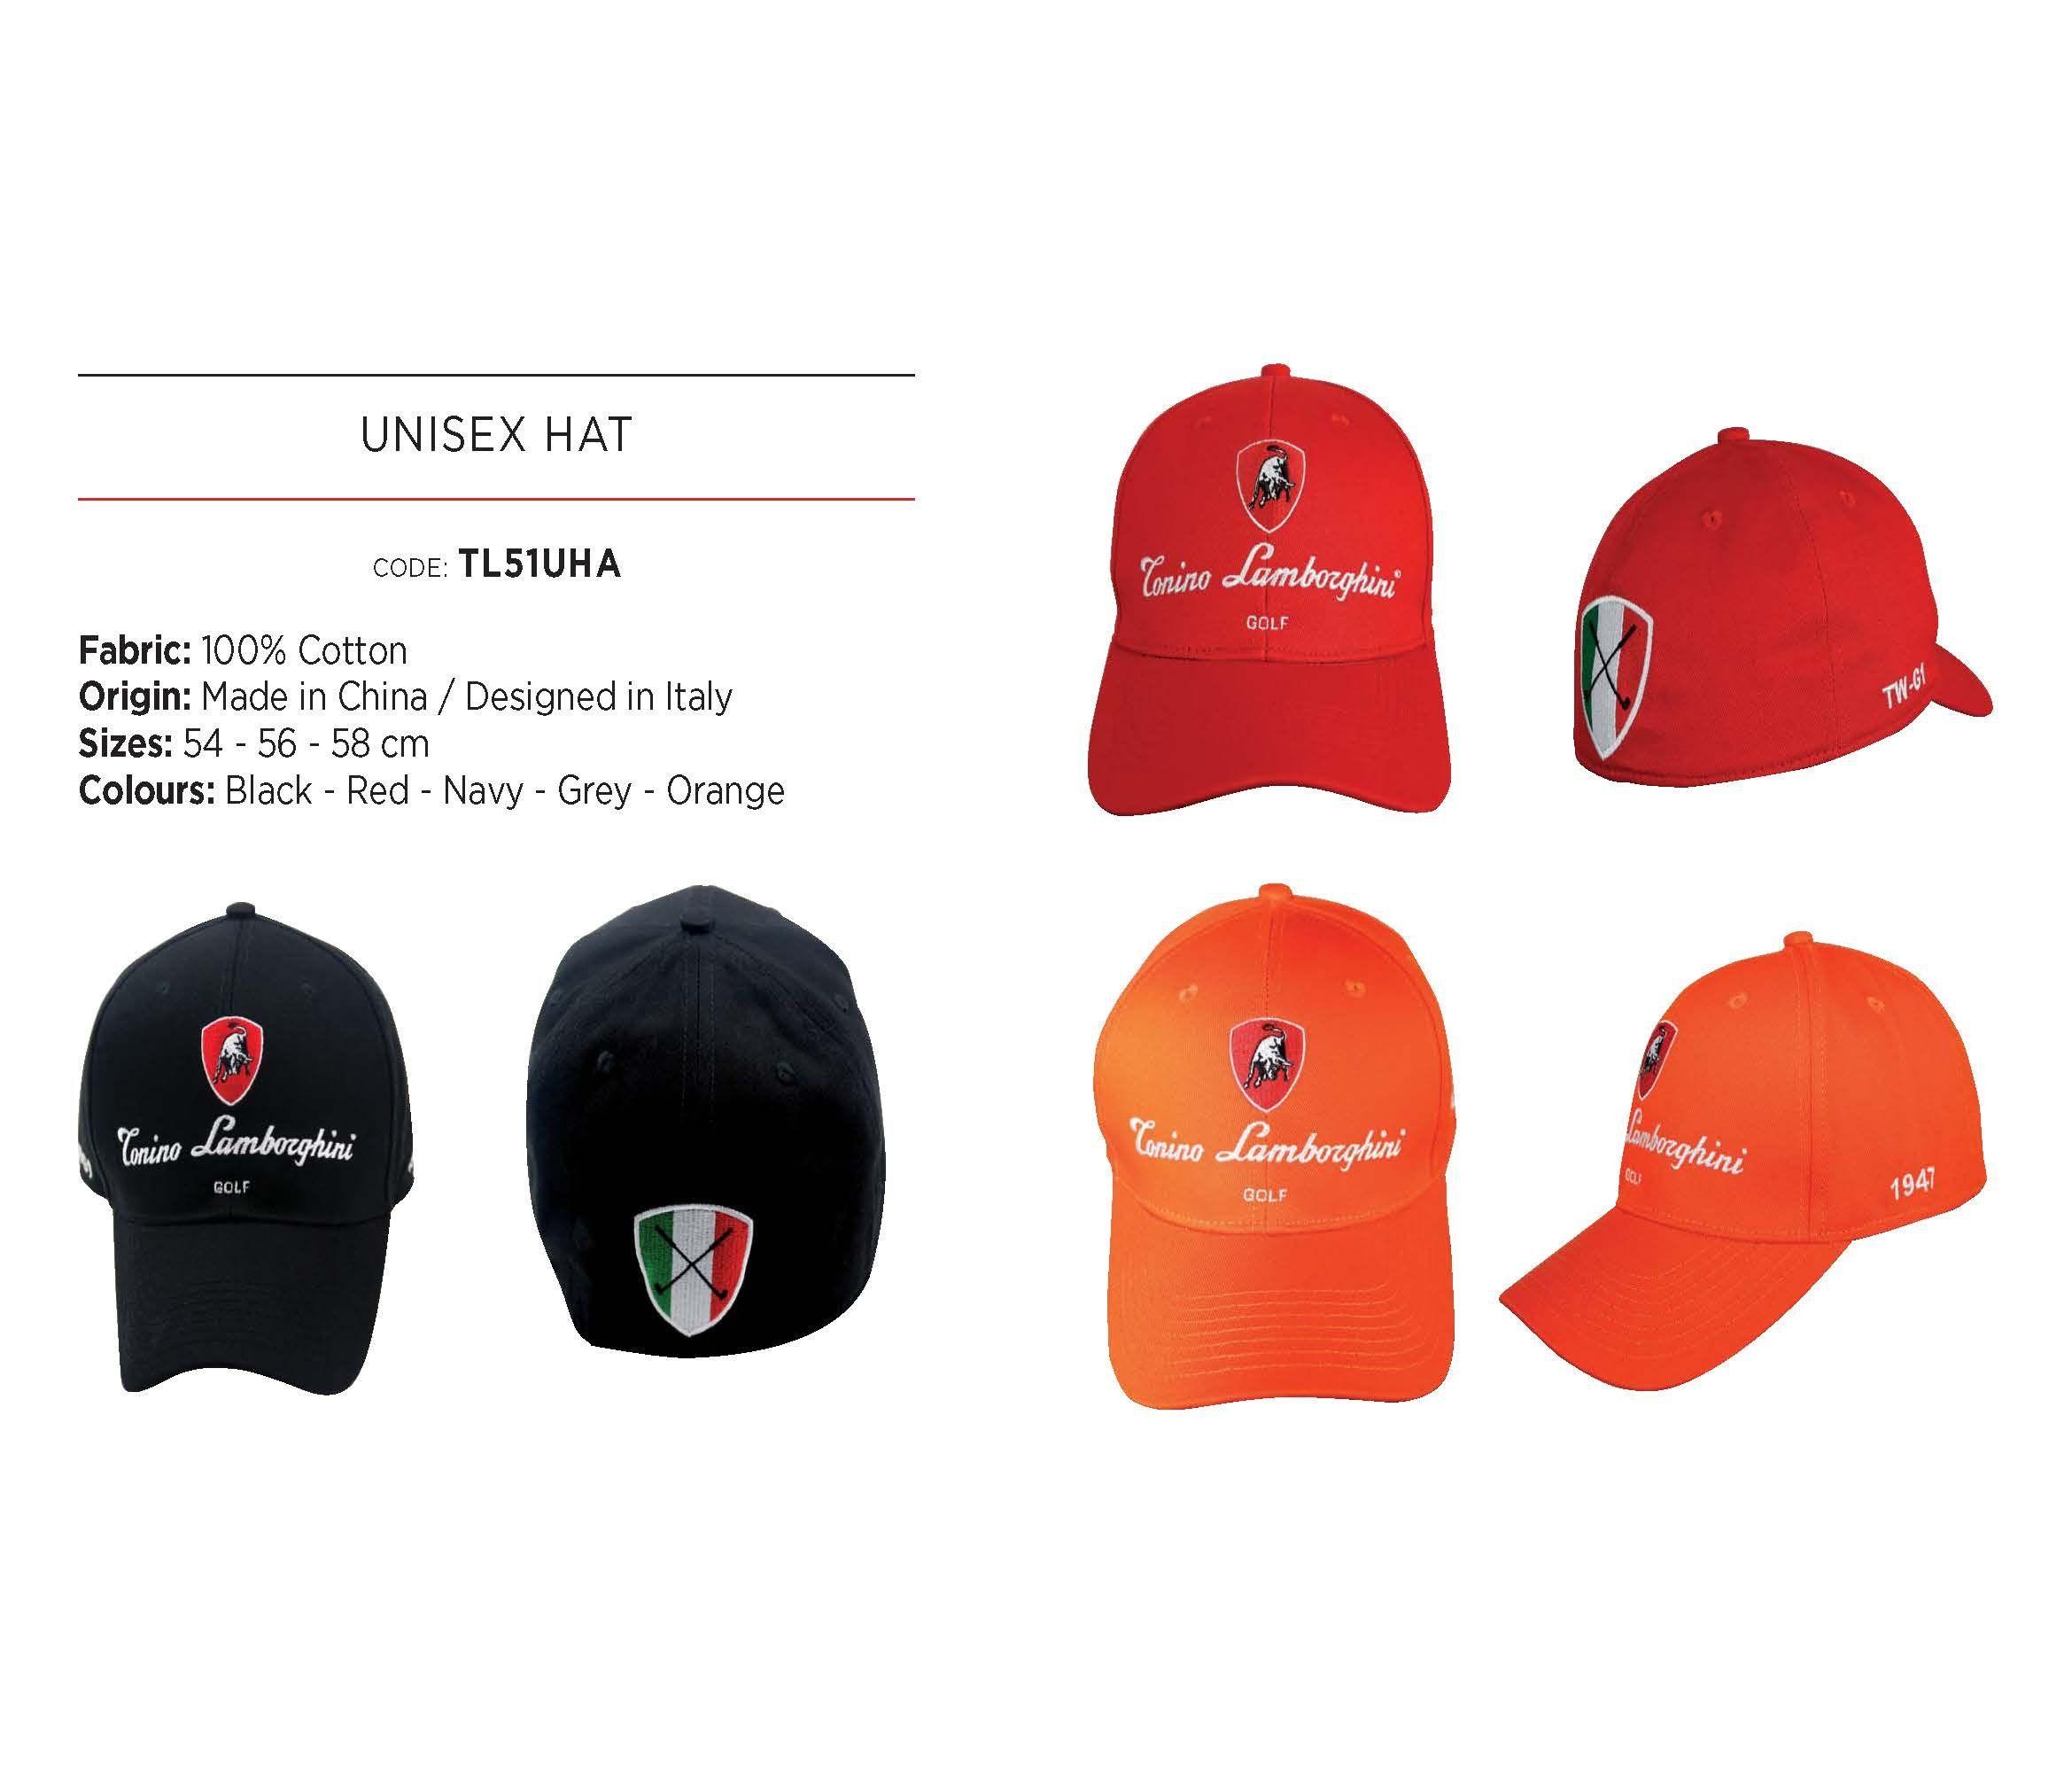 a18e8585348 Men Golf Clothing - Tonino Lamborghini Unisex Cotton Golf Cap Black 54 cm.